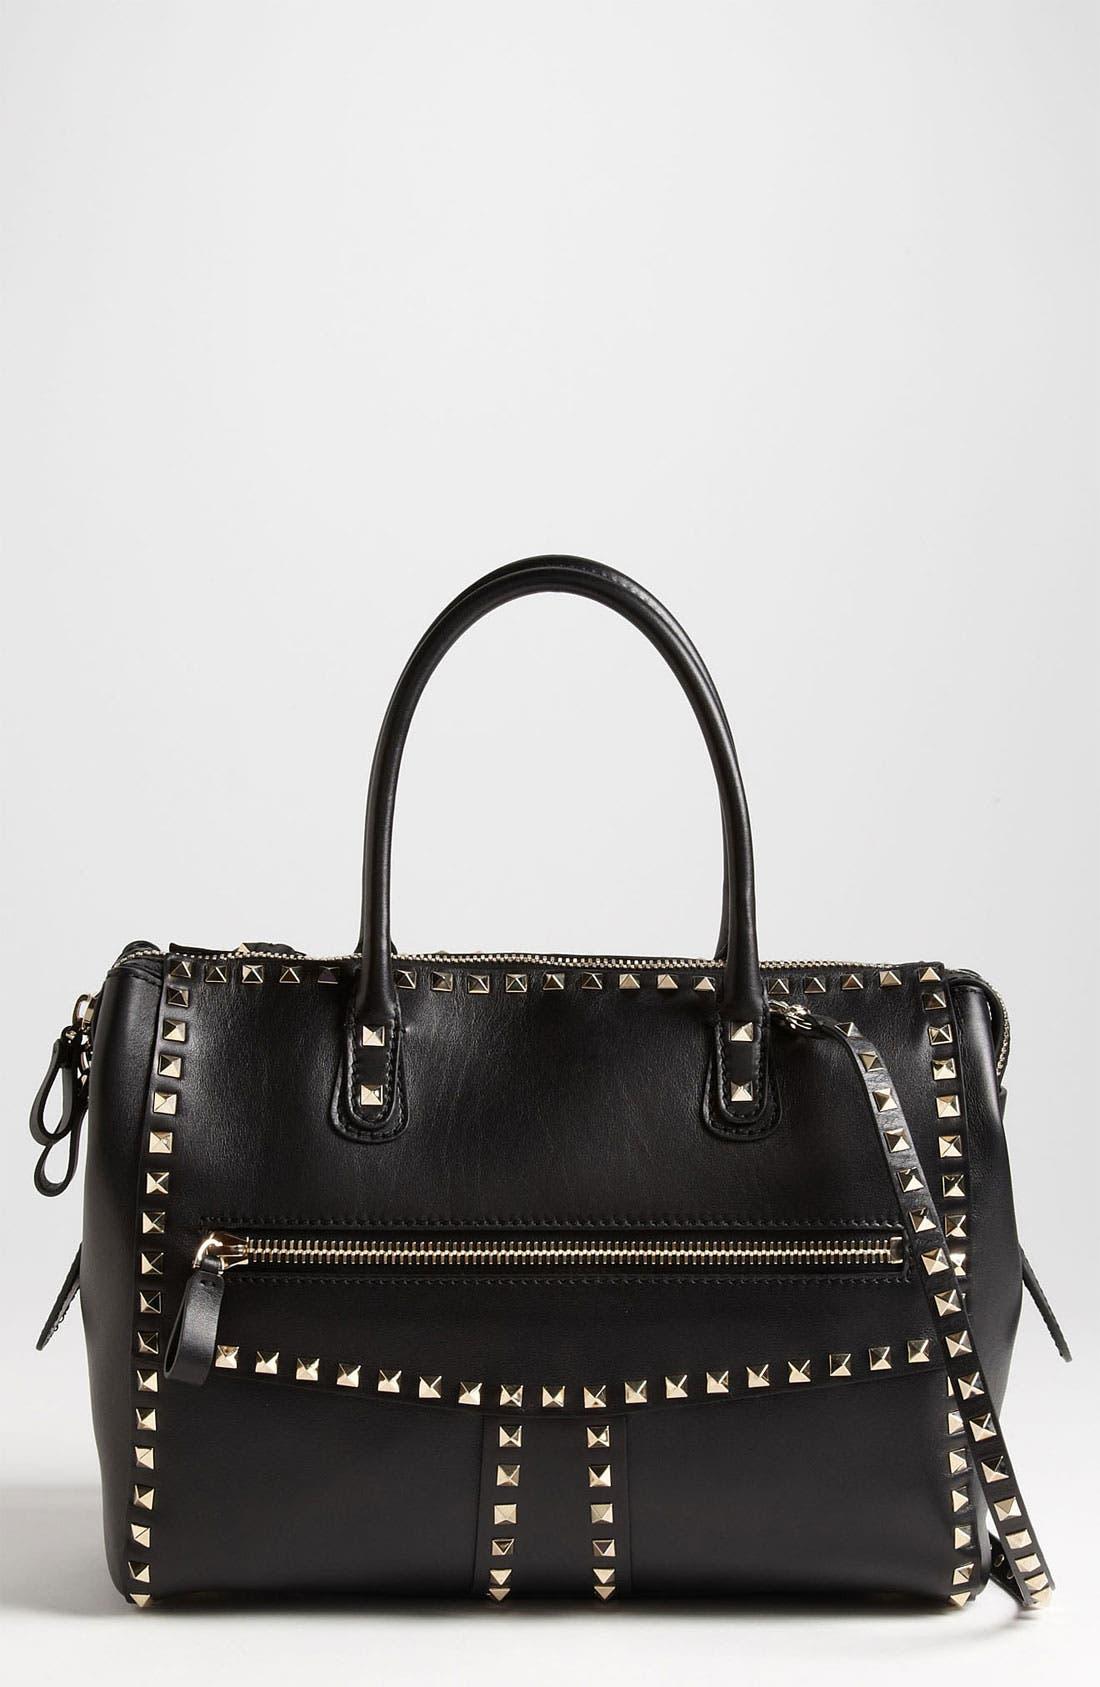 Main Image - Valentino 'Rockstud - Small' Leather Handbag